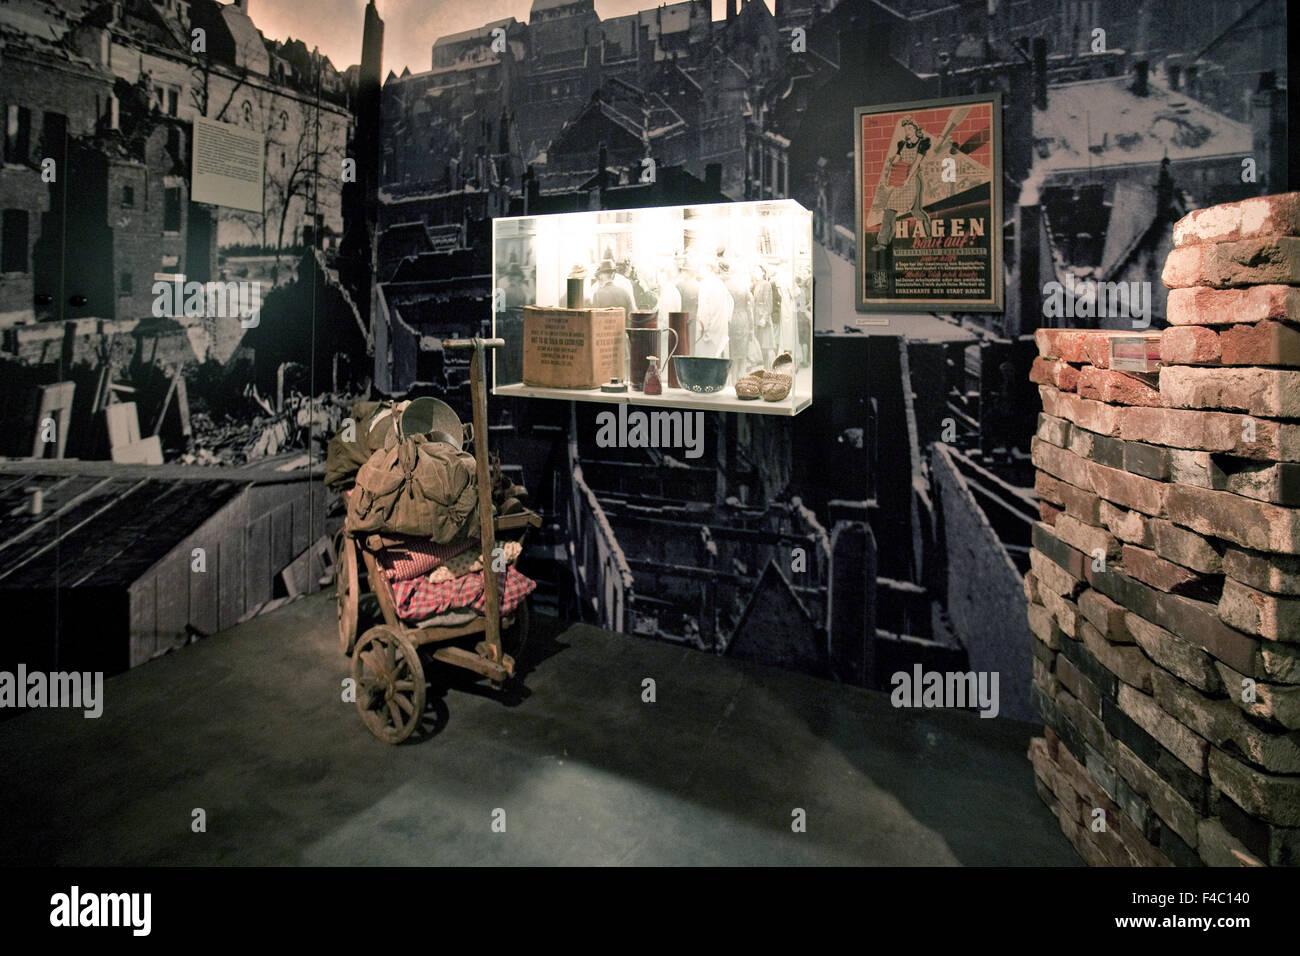 Exhibition City Museum, Hagen, Germany - Stock Image